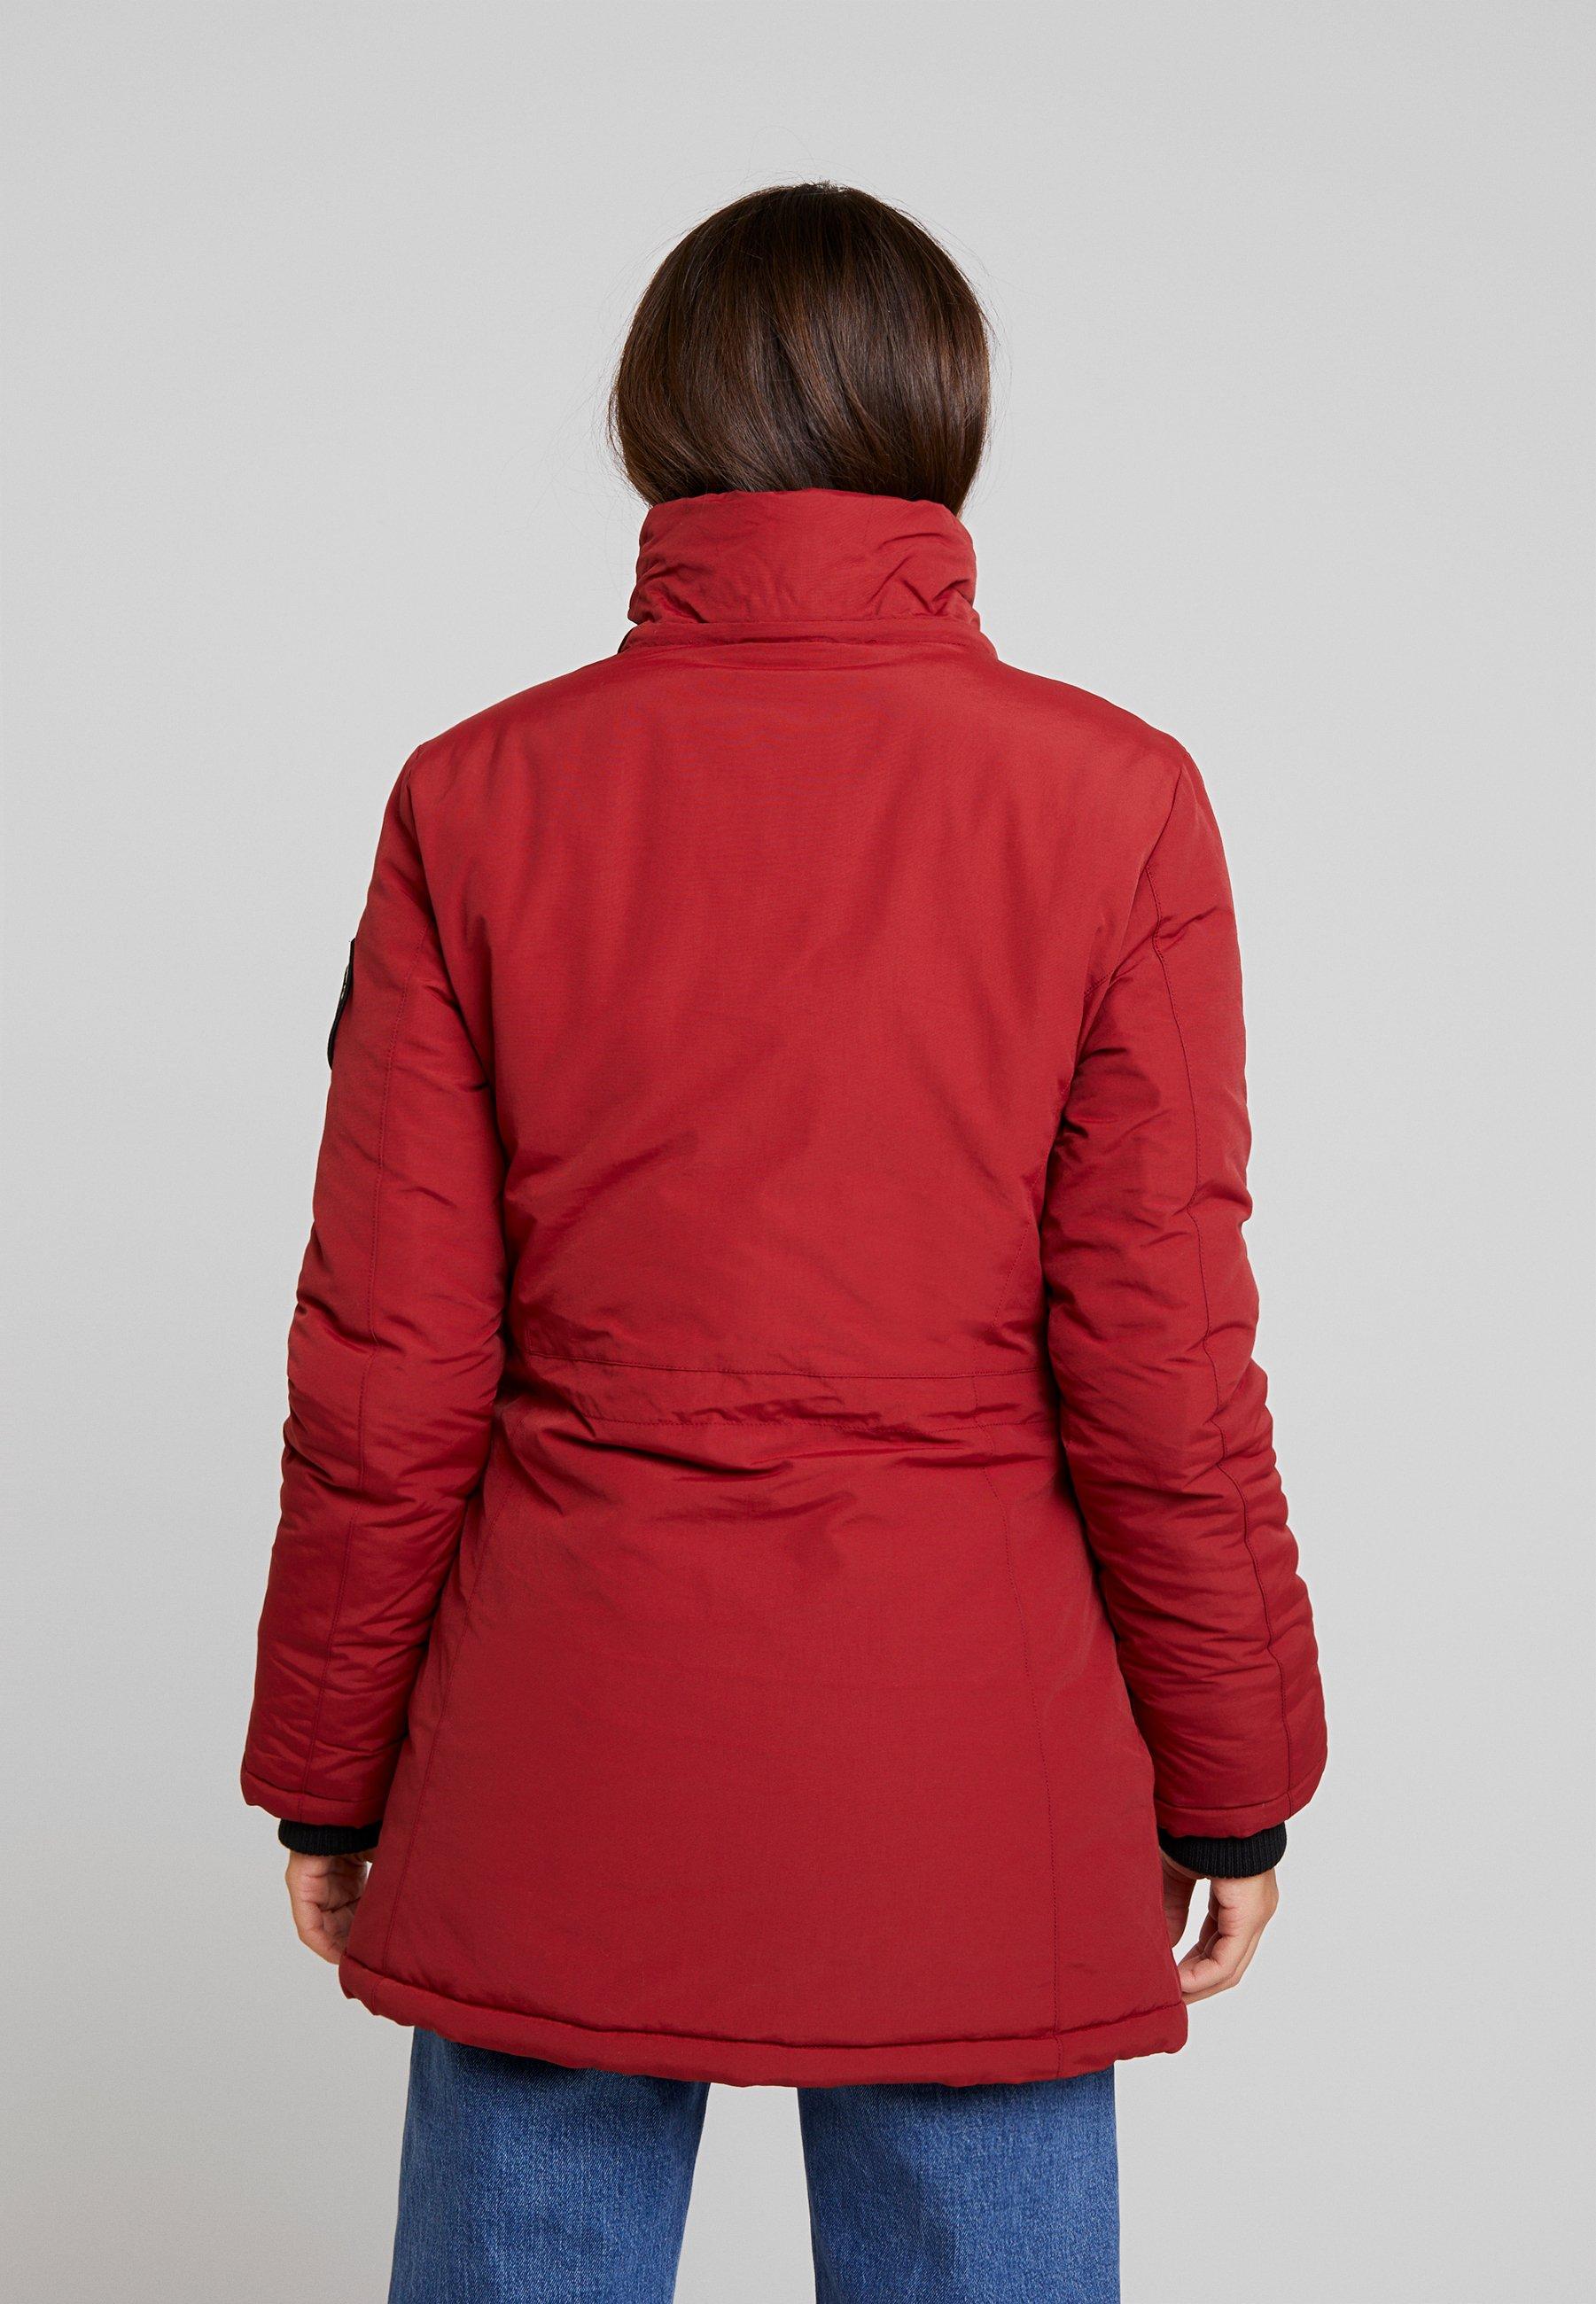 Superdry Ashley Everest Parka Jacket Brick Red